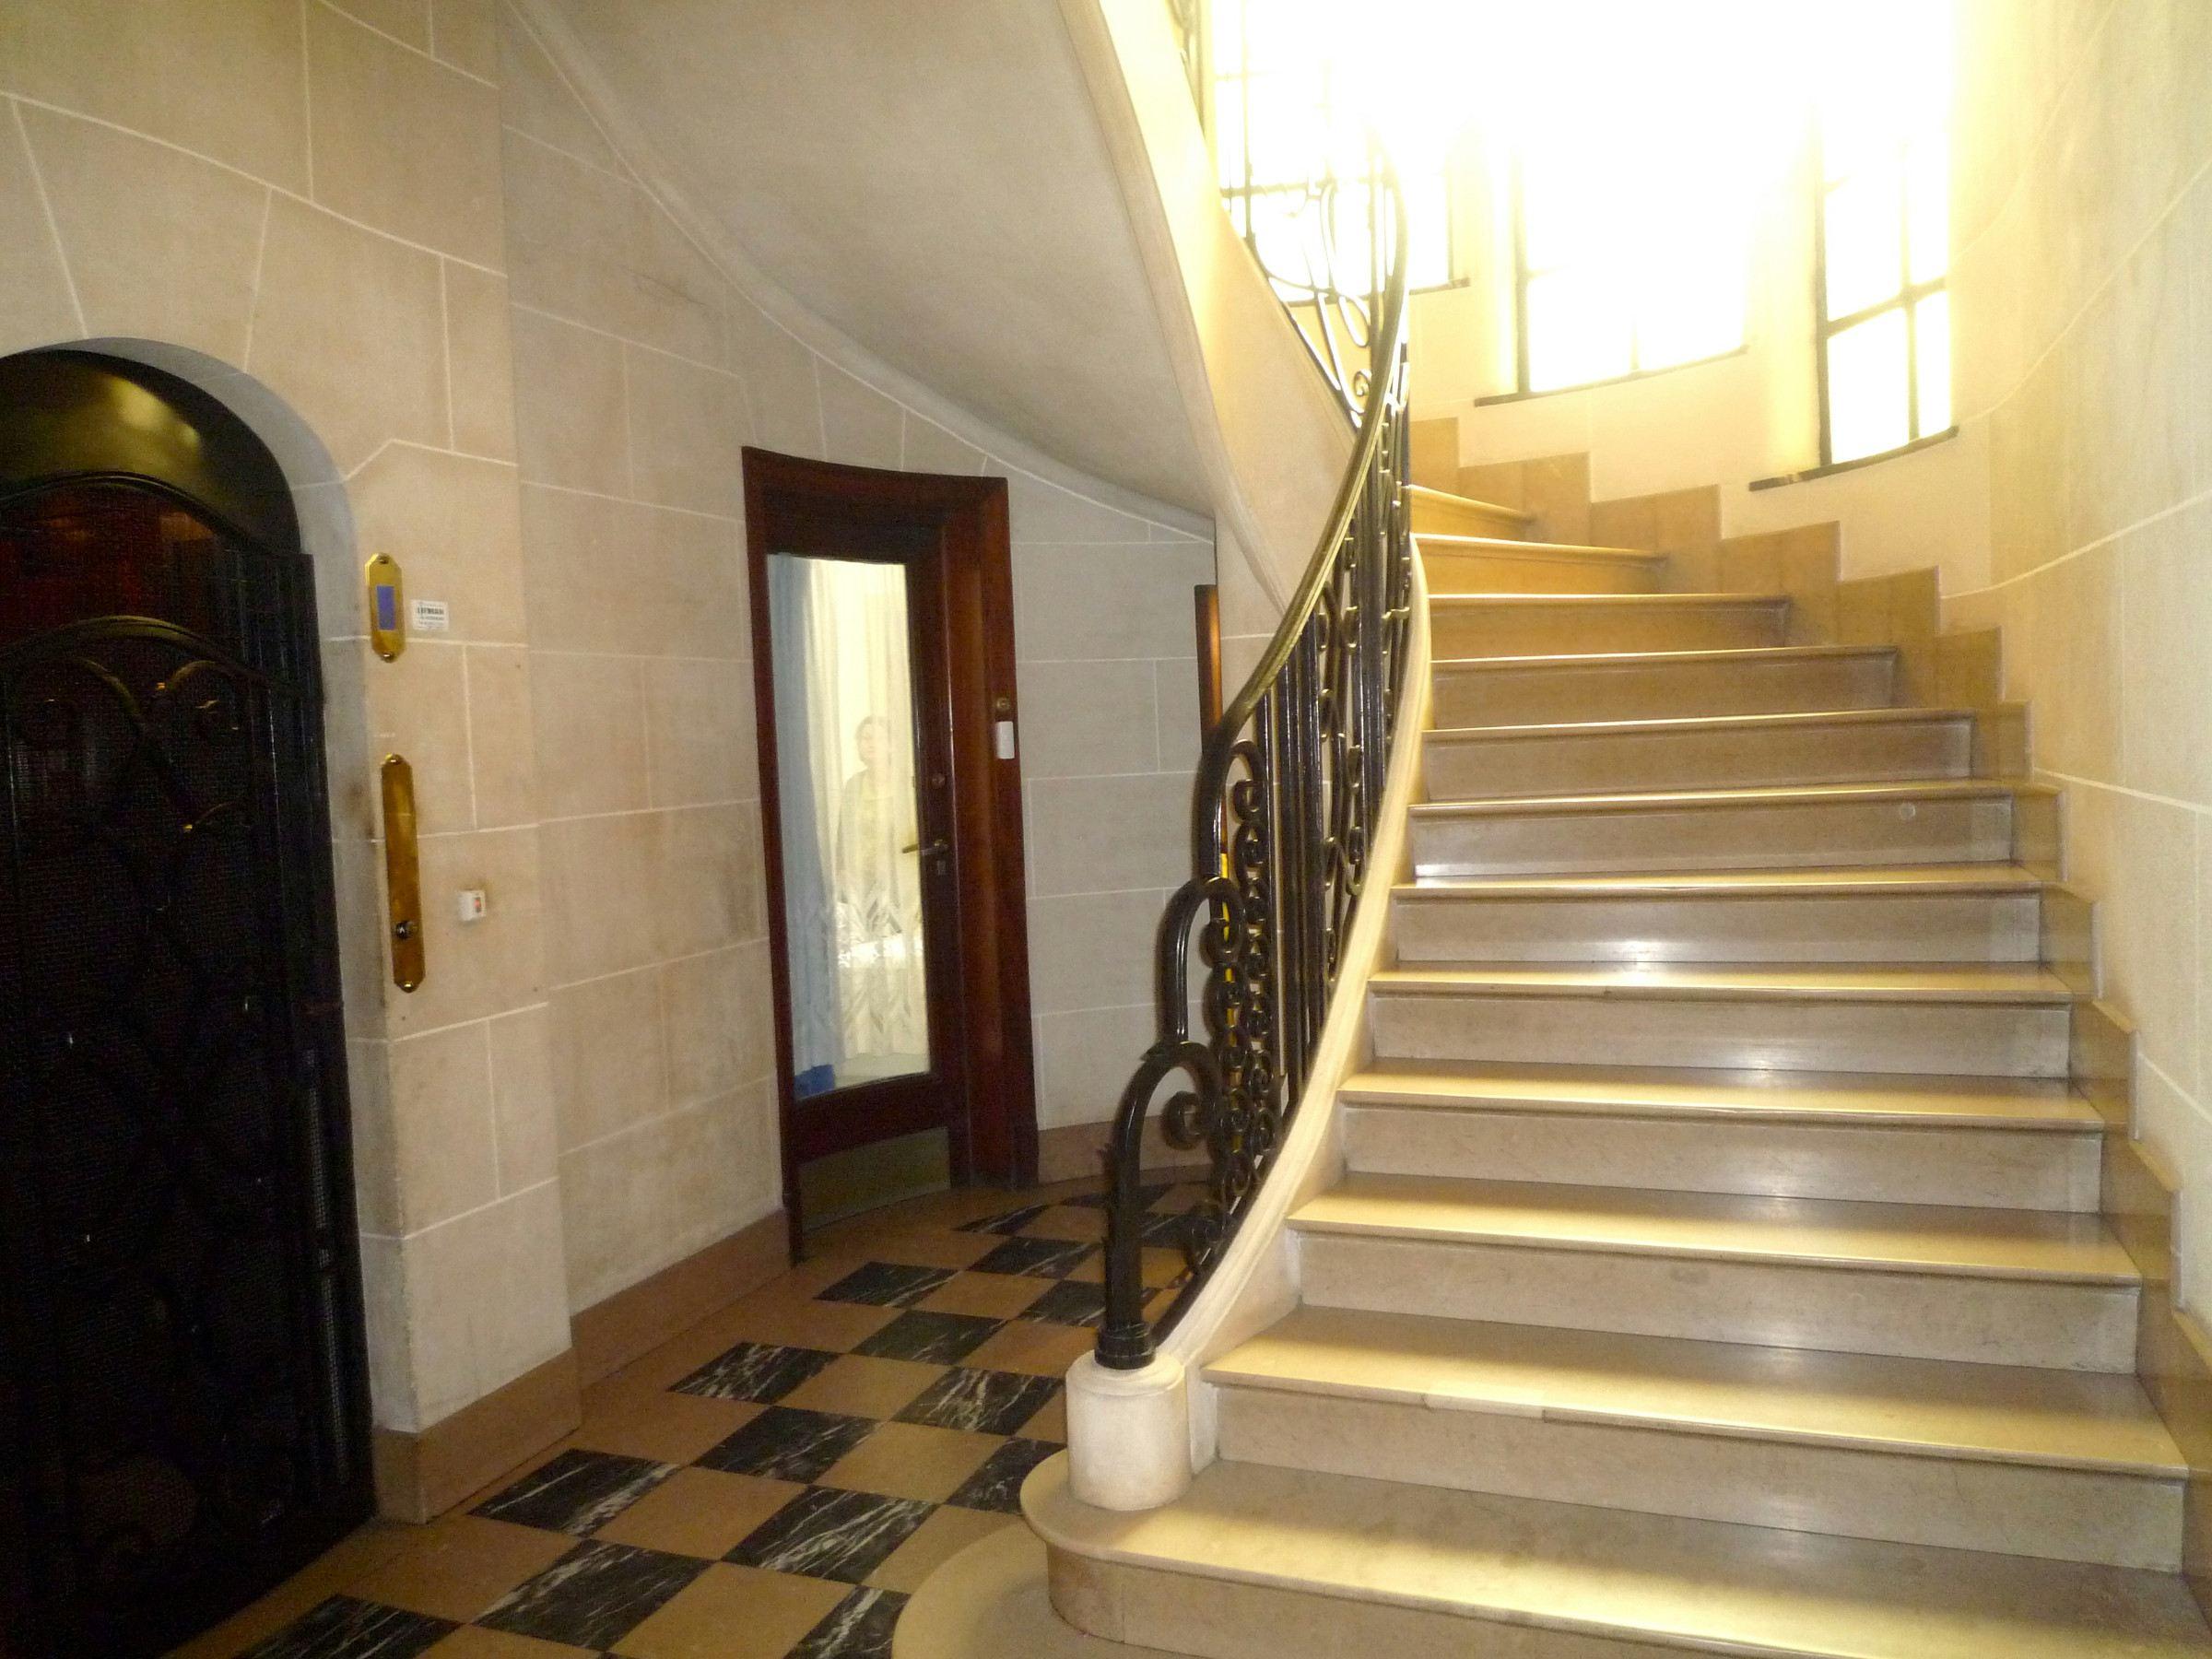 Property For Sale at LA MADELEINE, District Botanique, exceptional Appt. 220 sq.m . 6 beds